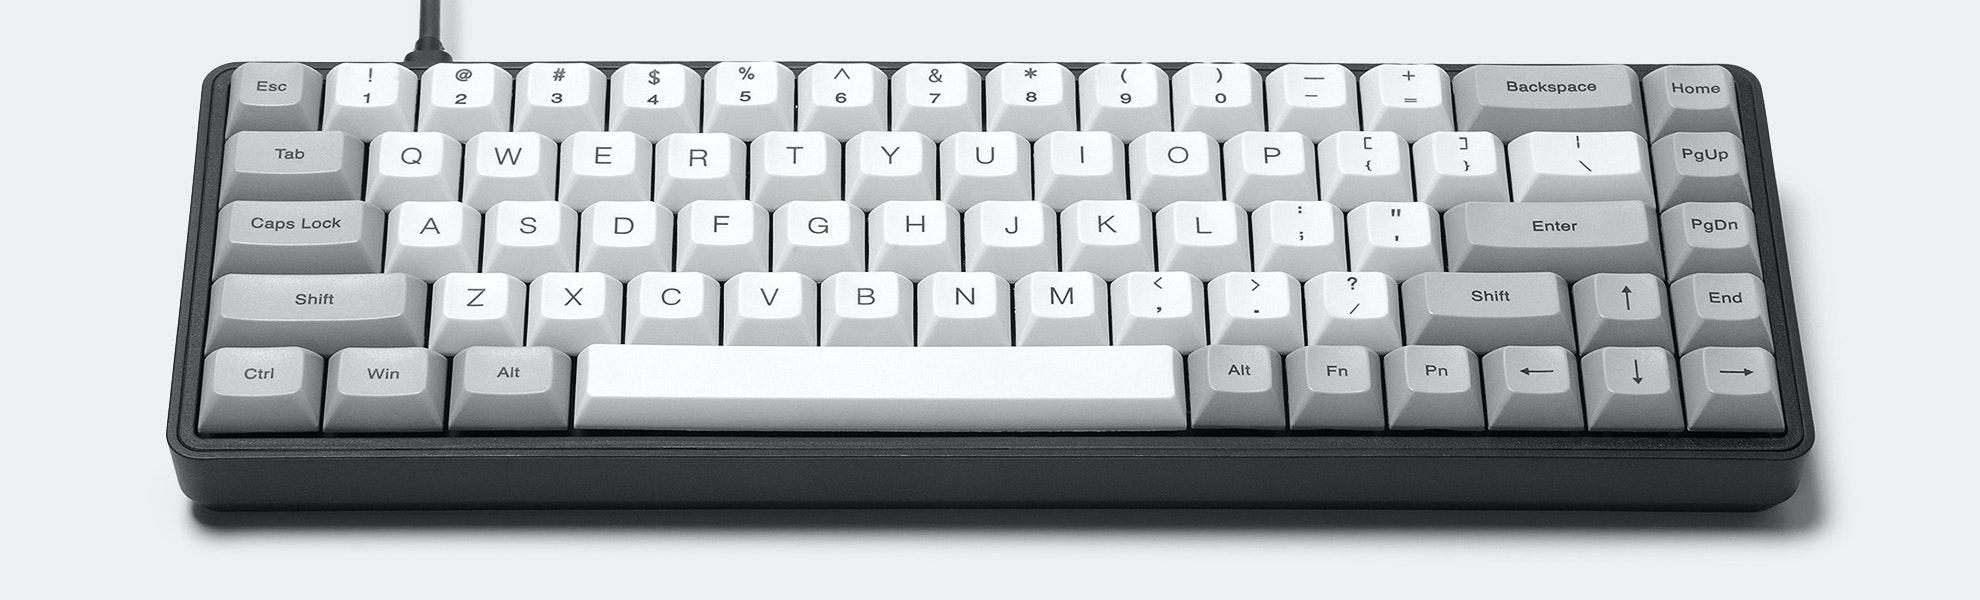 Vortex Cypher Mechanical Keyboard